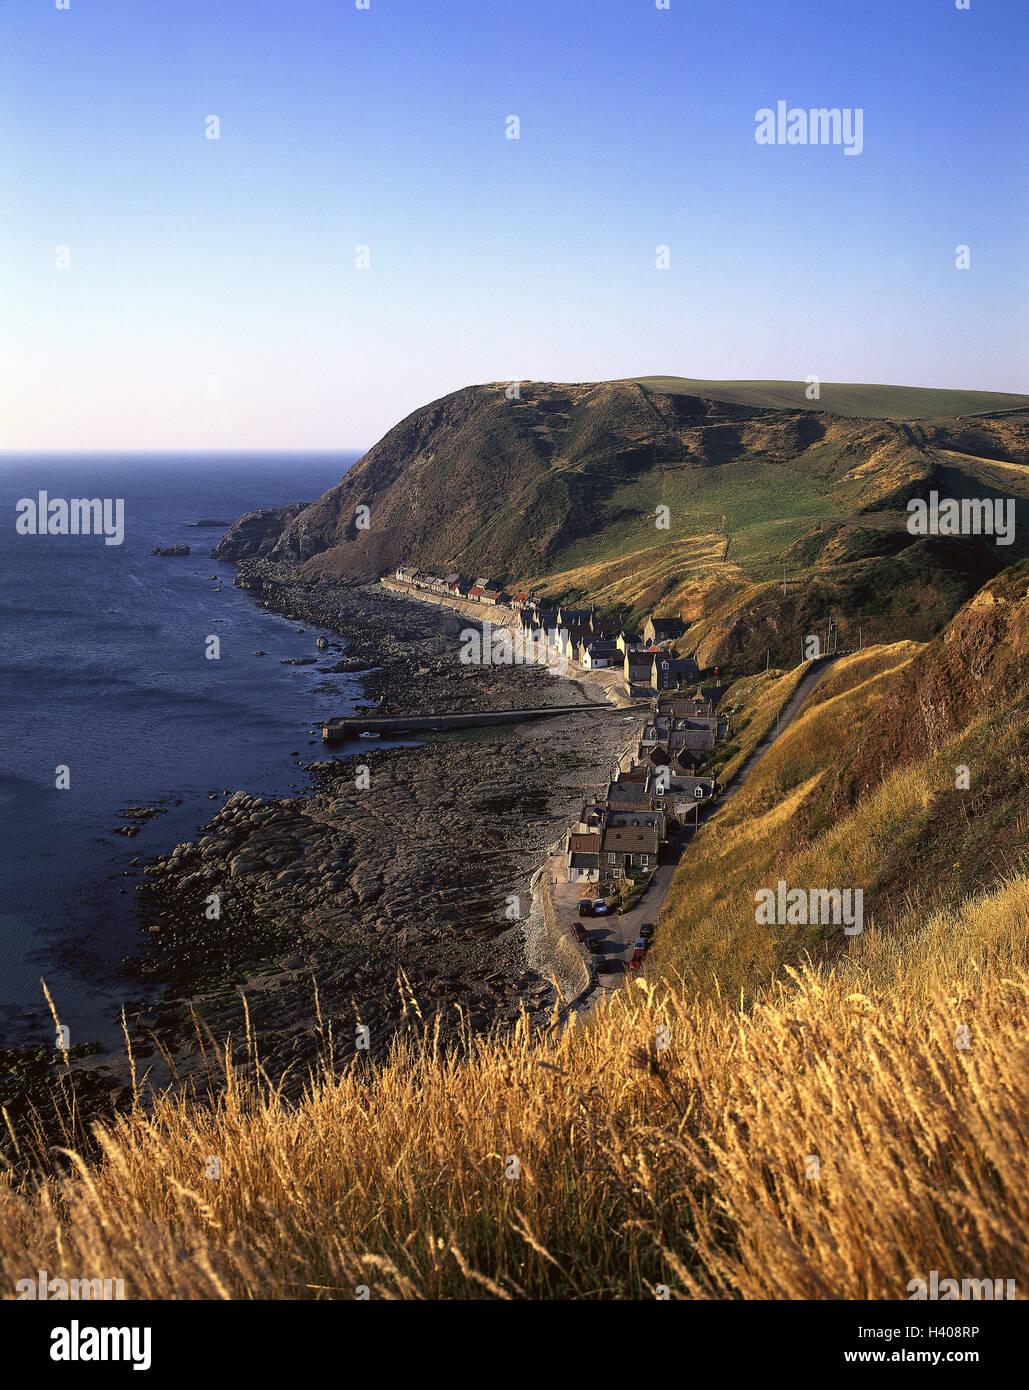 Banffshire Coast Stock Photos & Banffshire Coast Stock ...